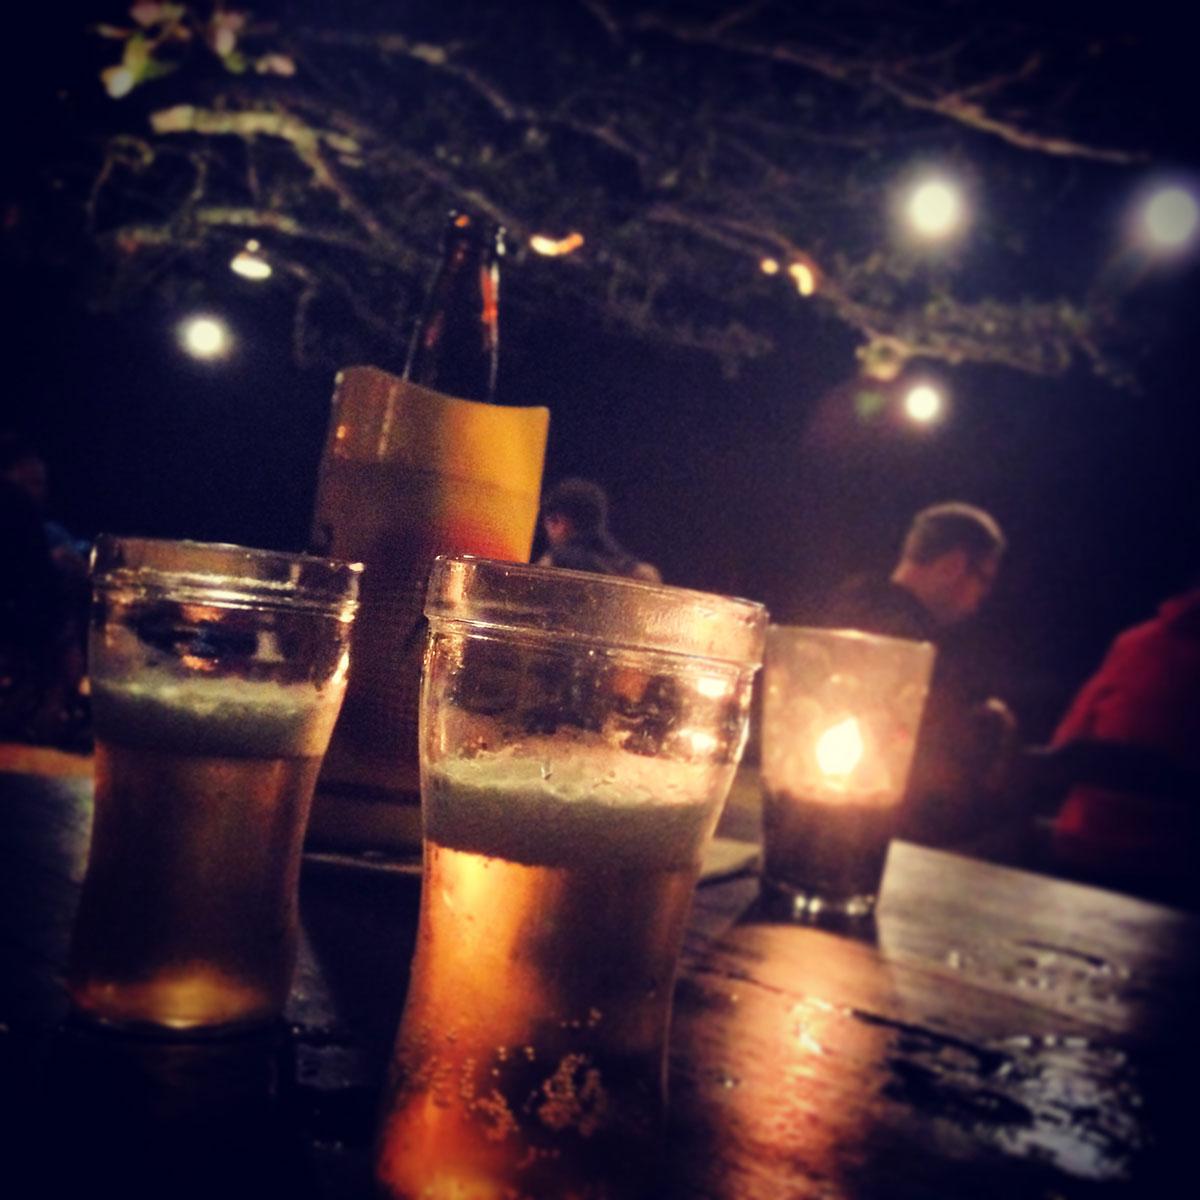 Brasilianische Biere